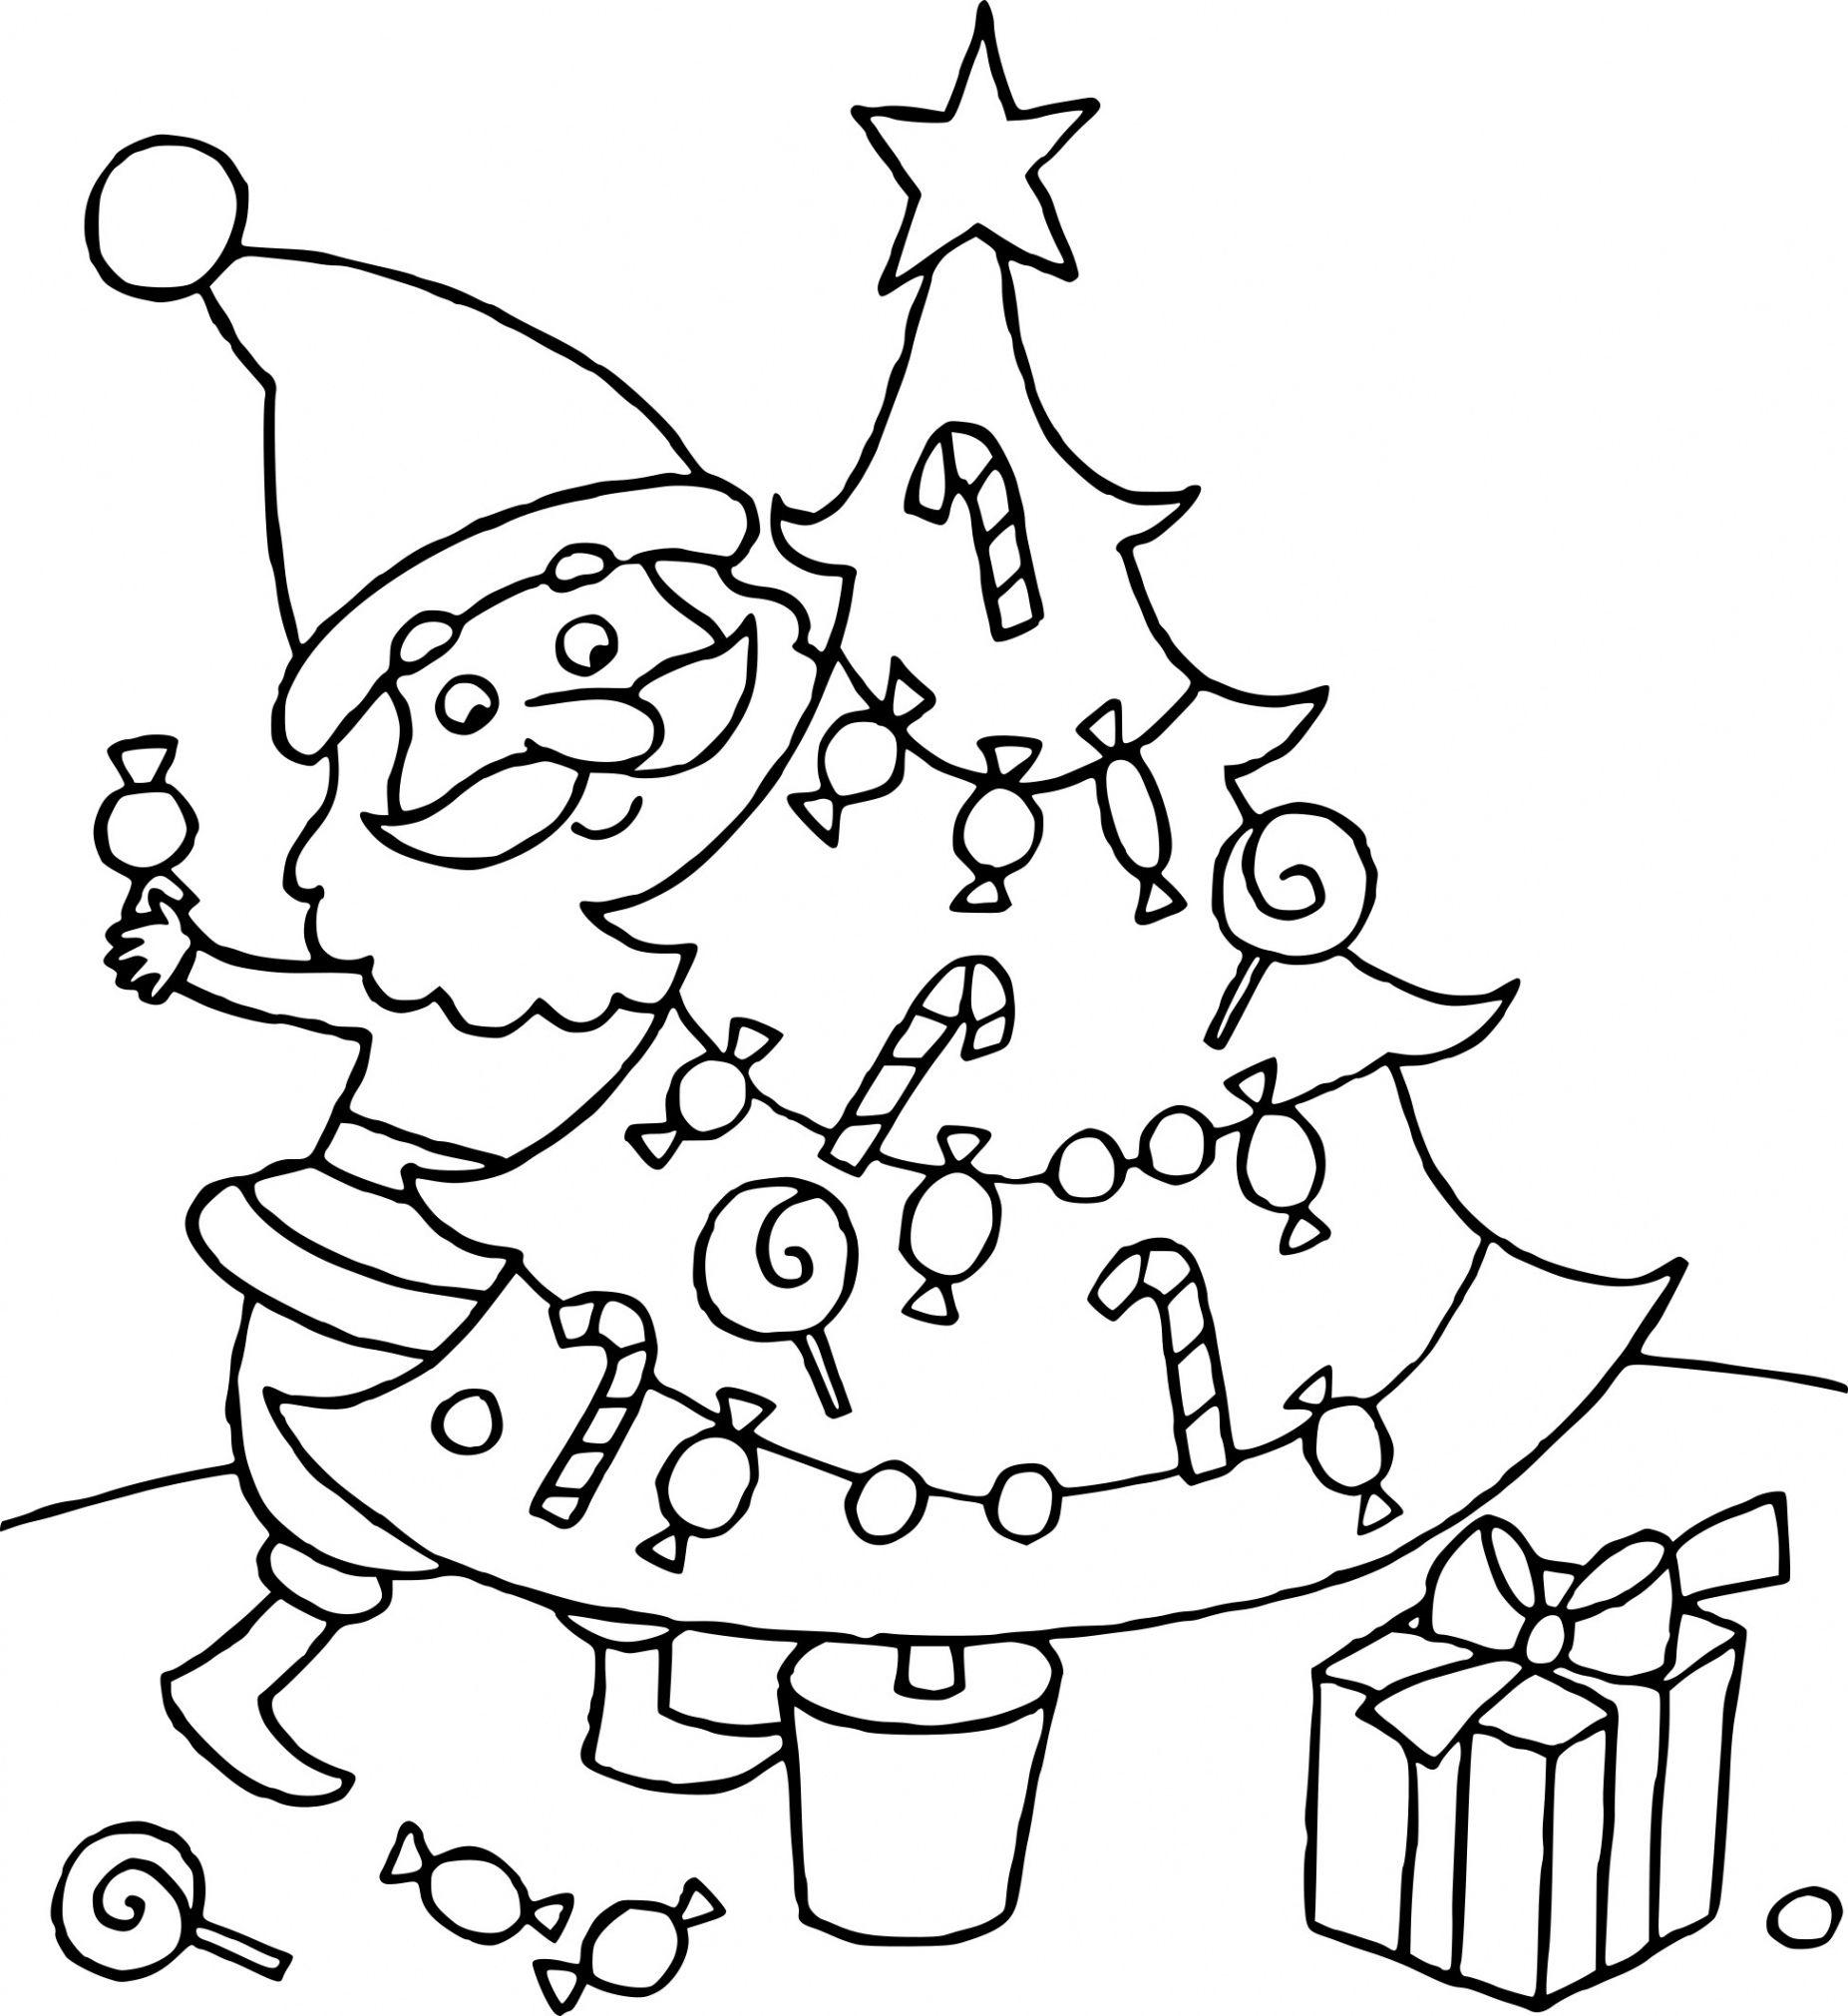 Coloriage Sapin De Noël Cadeaux À Imprimer regarding Dessin Sapin De Noel A Imprimer Gratuit ...